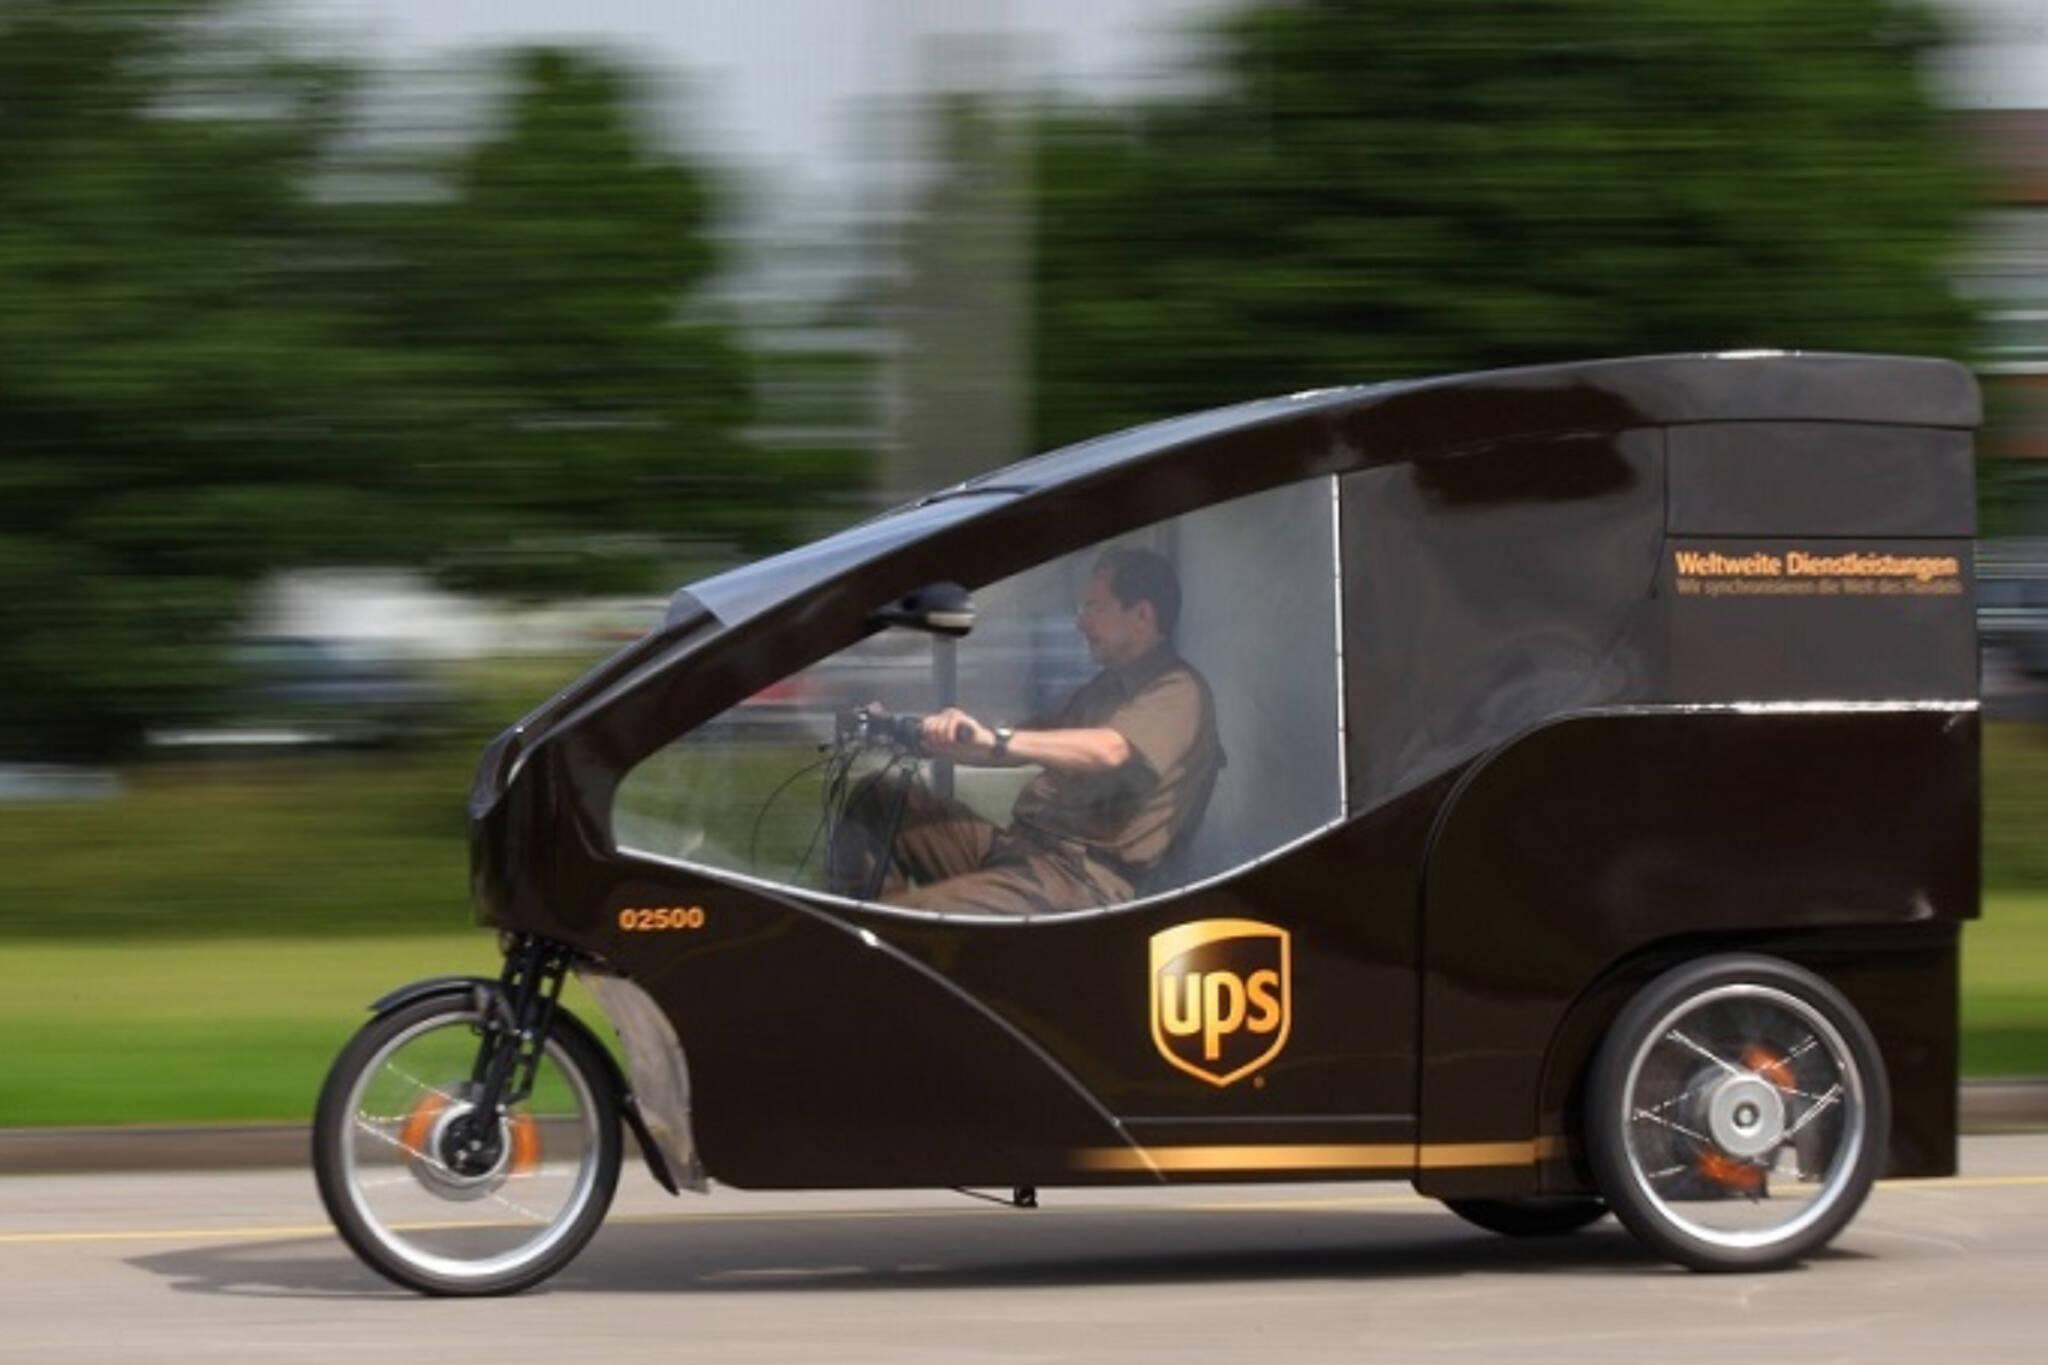 UPS bike toronto